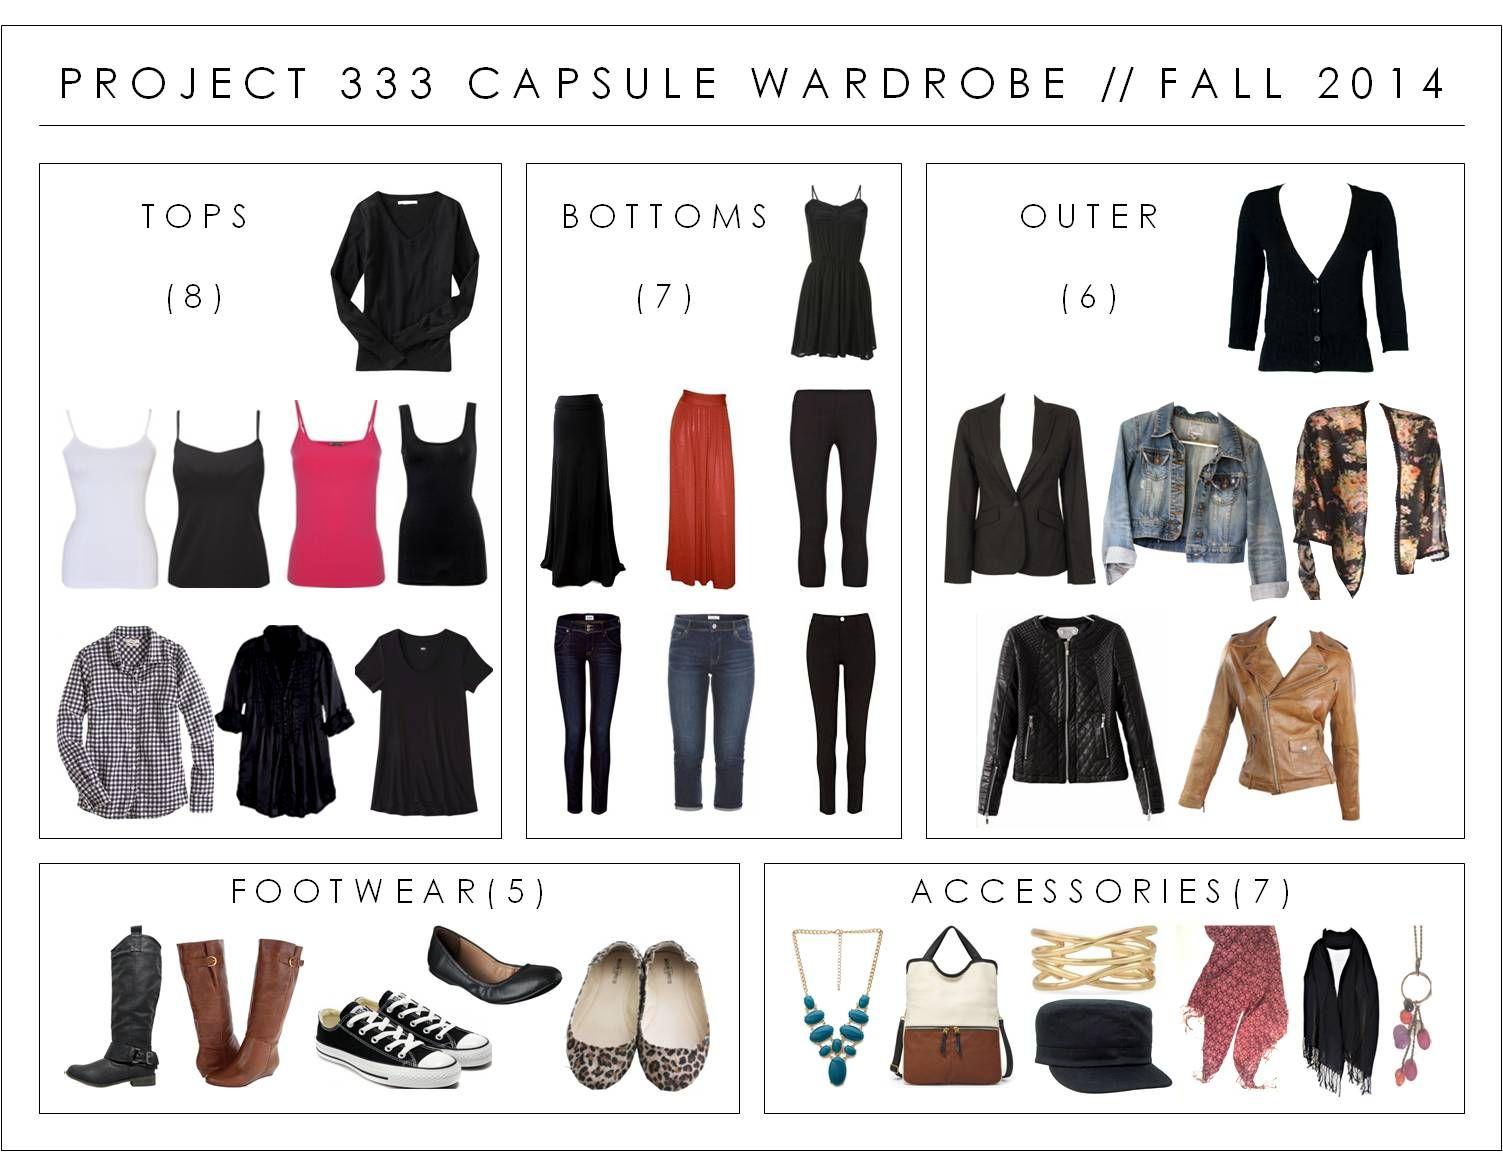 Fall 2014 Capsule Wardrobe 33 Items Fashion Fun